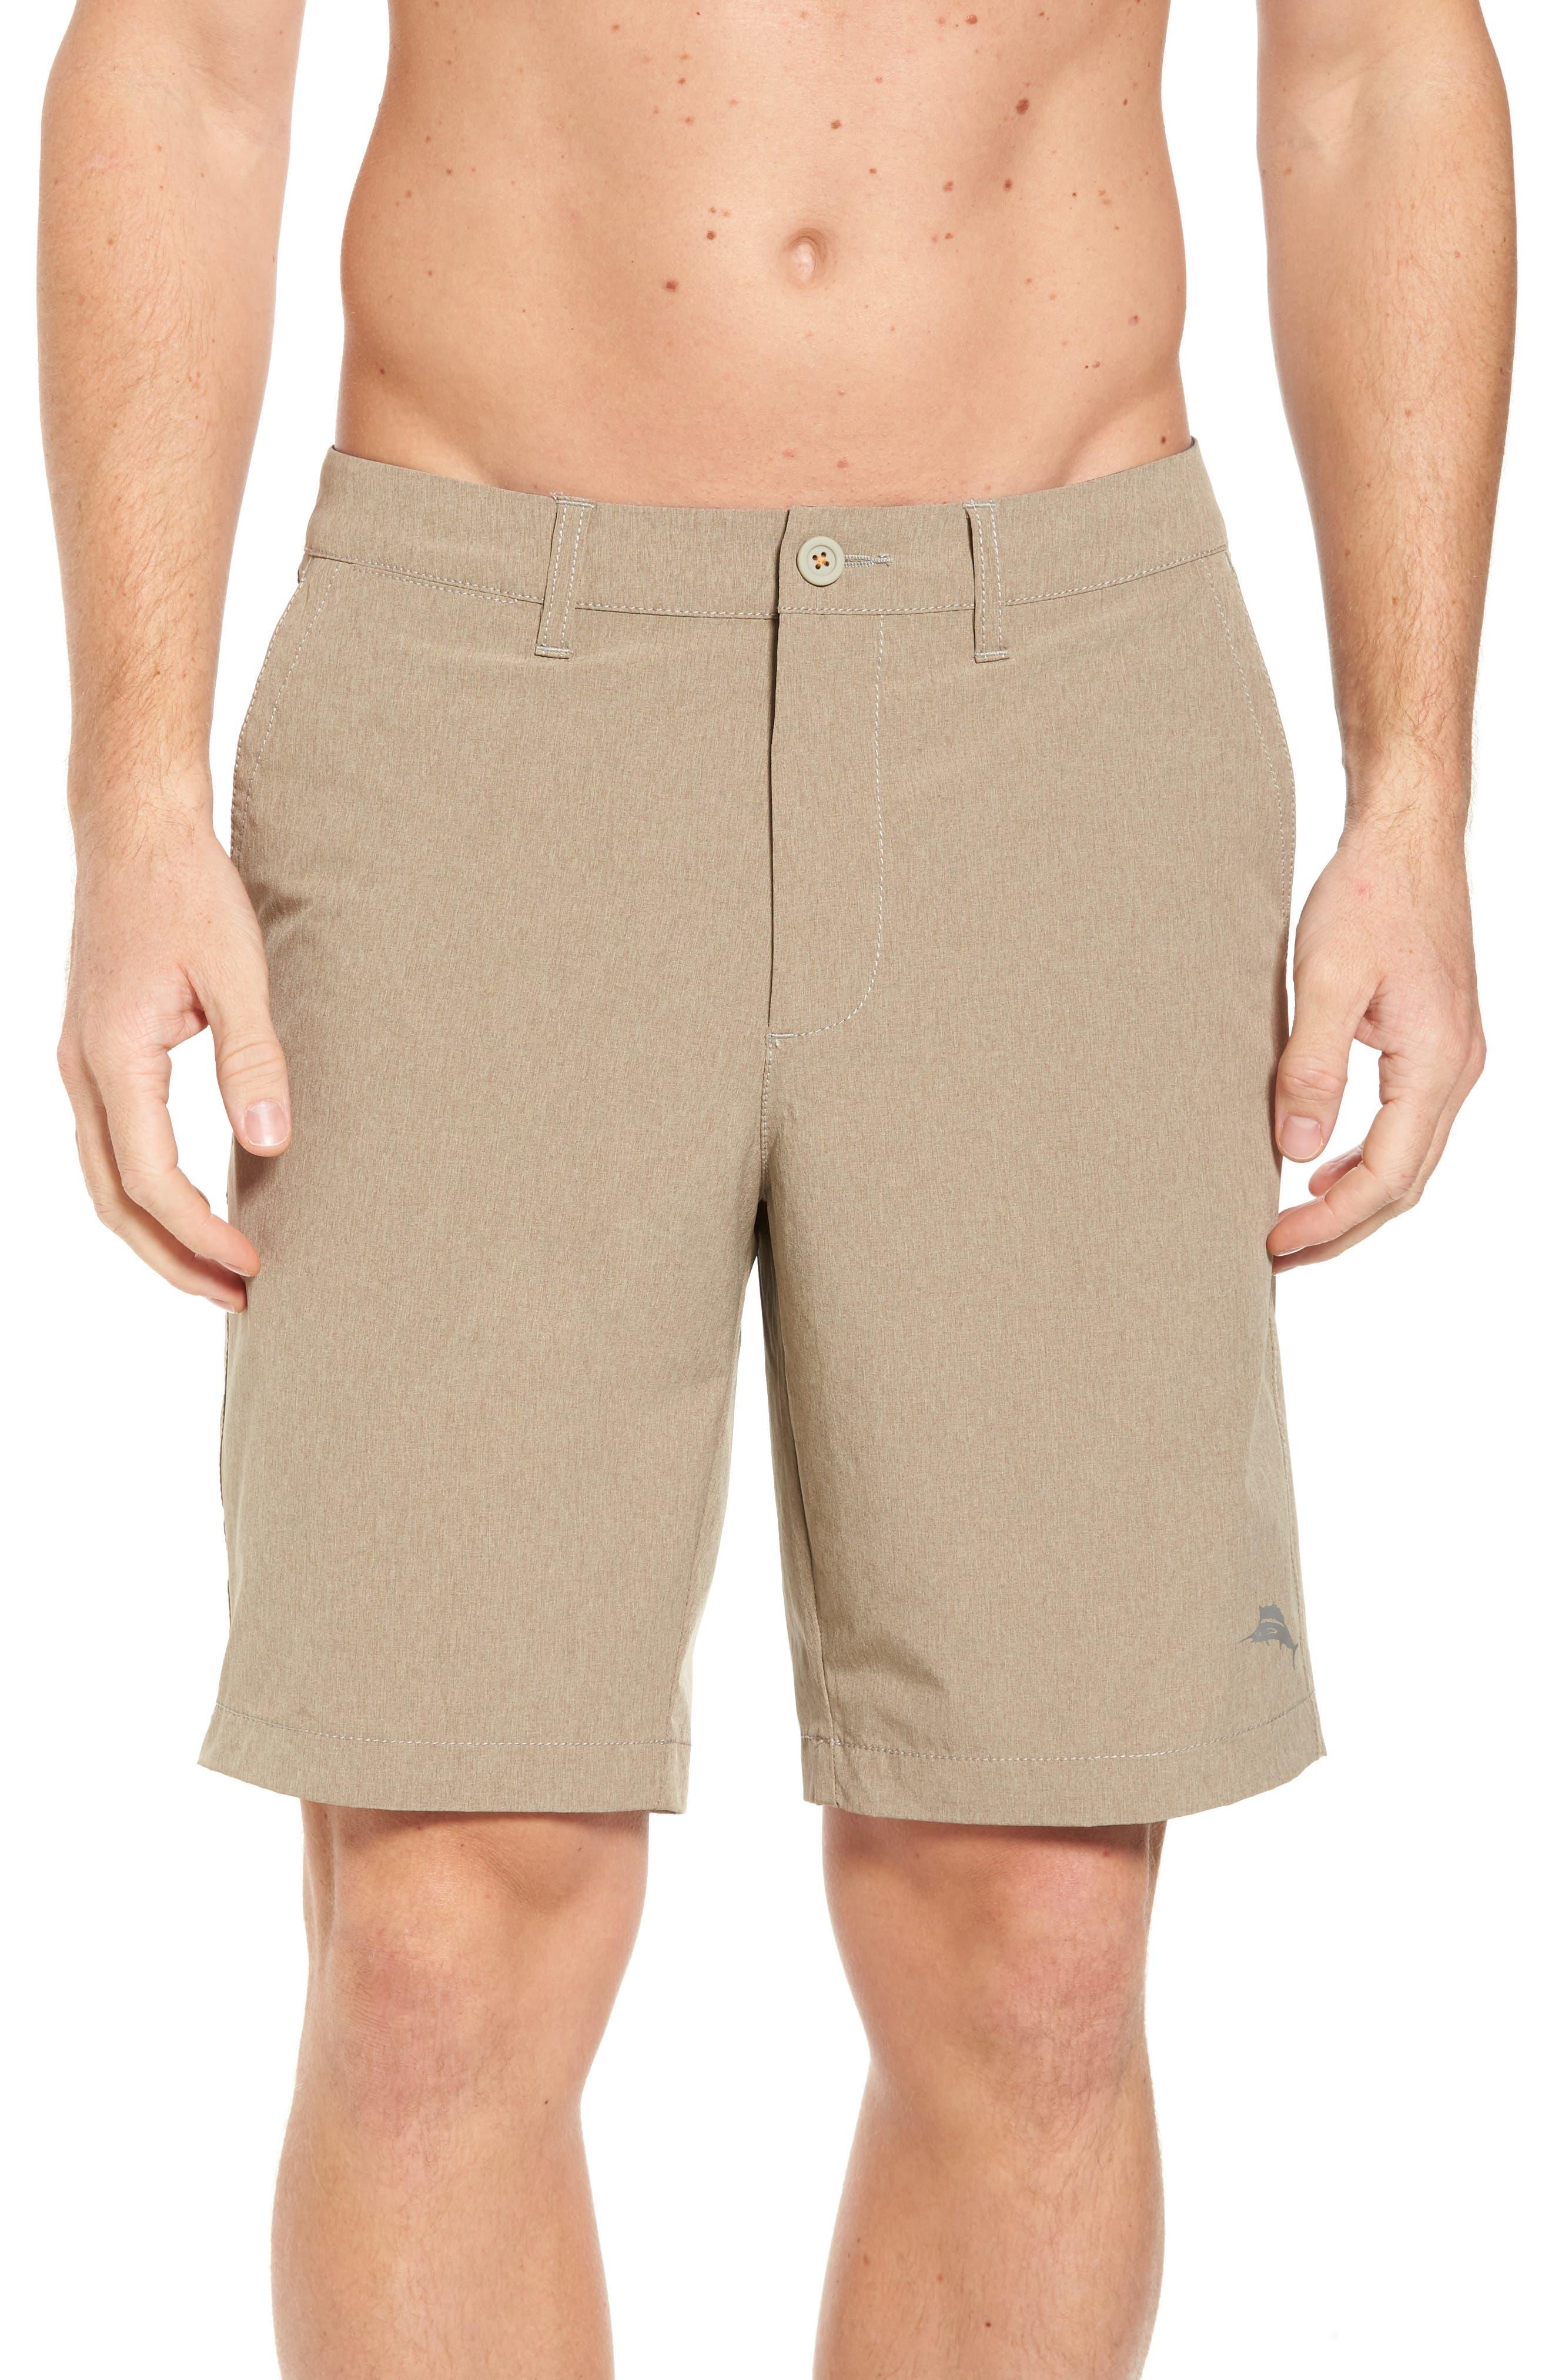 'Cayman Isles' Hybrid Swim Shorts,                         Main,                         color, Dark Twill